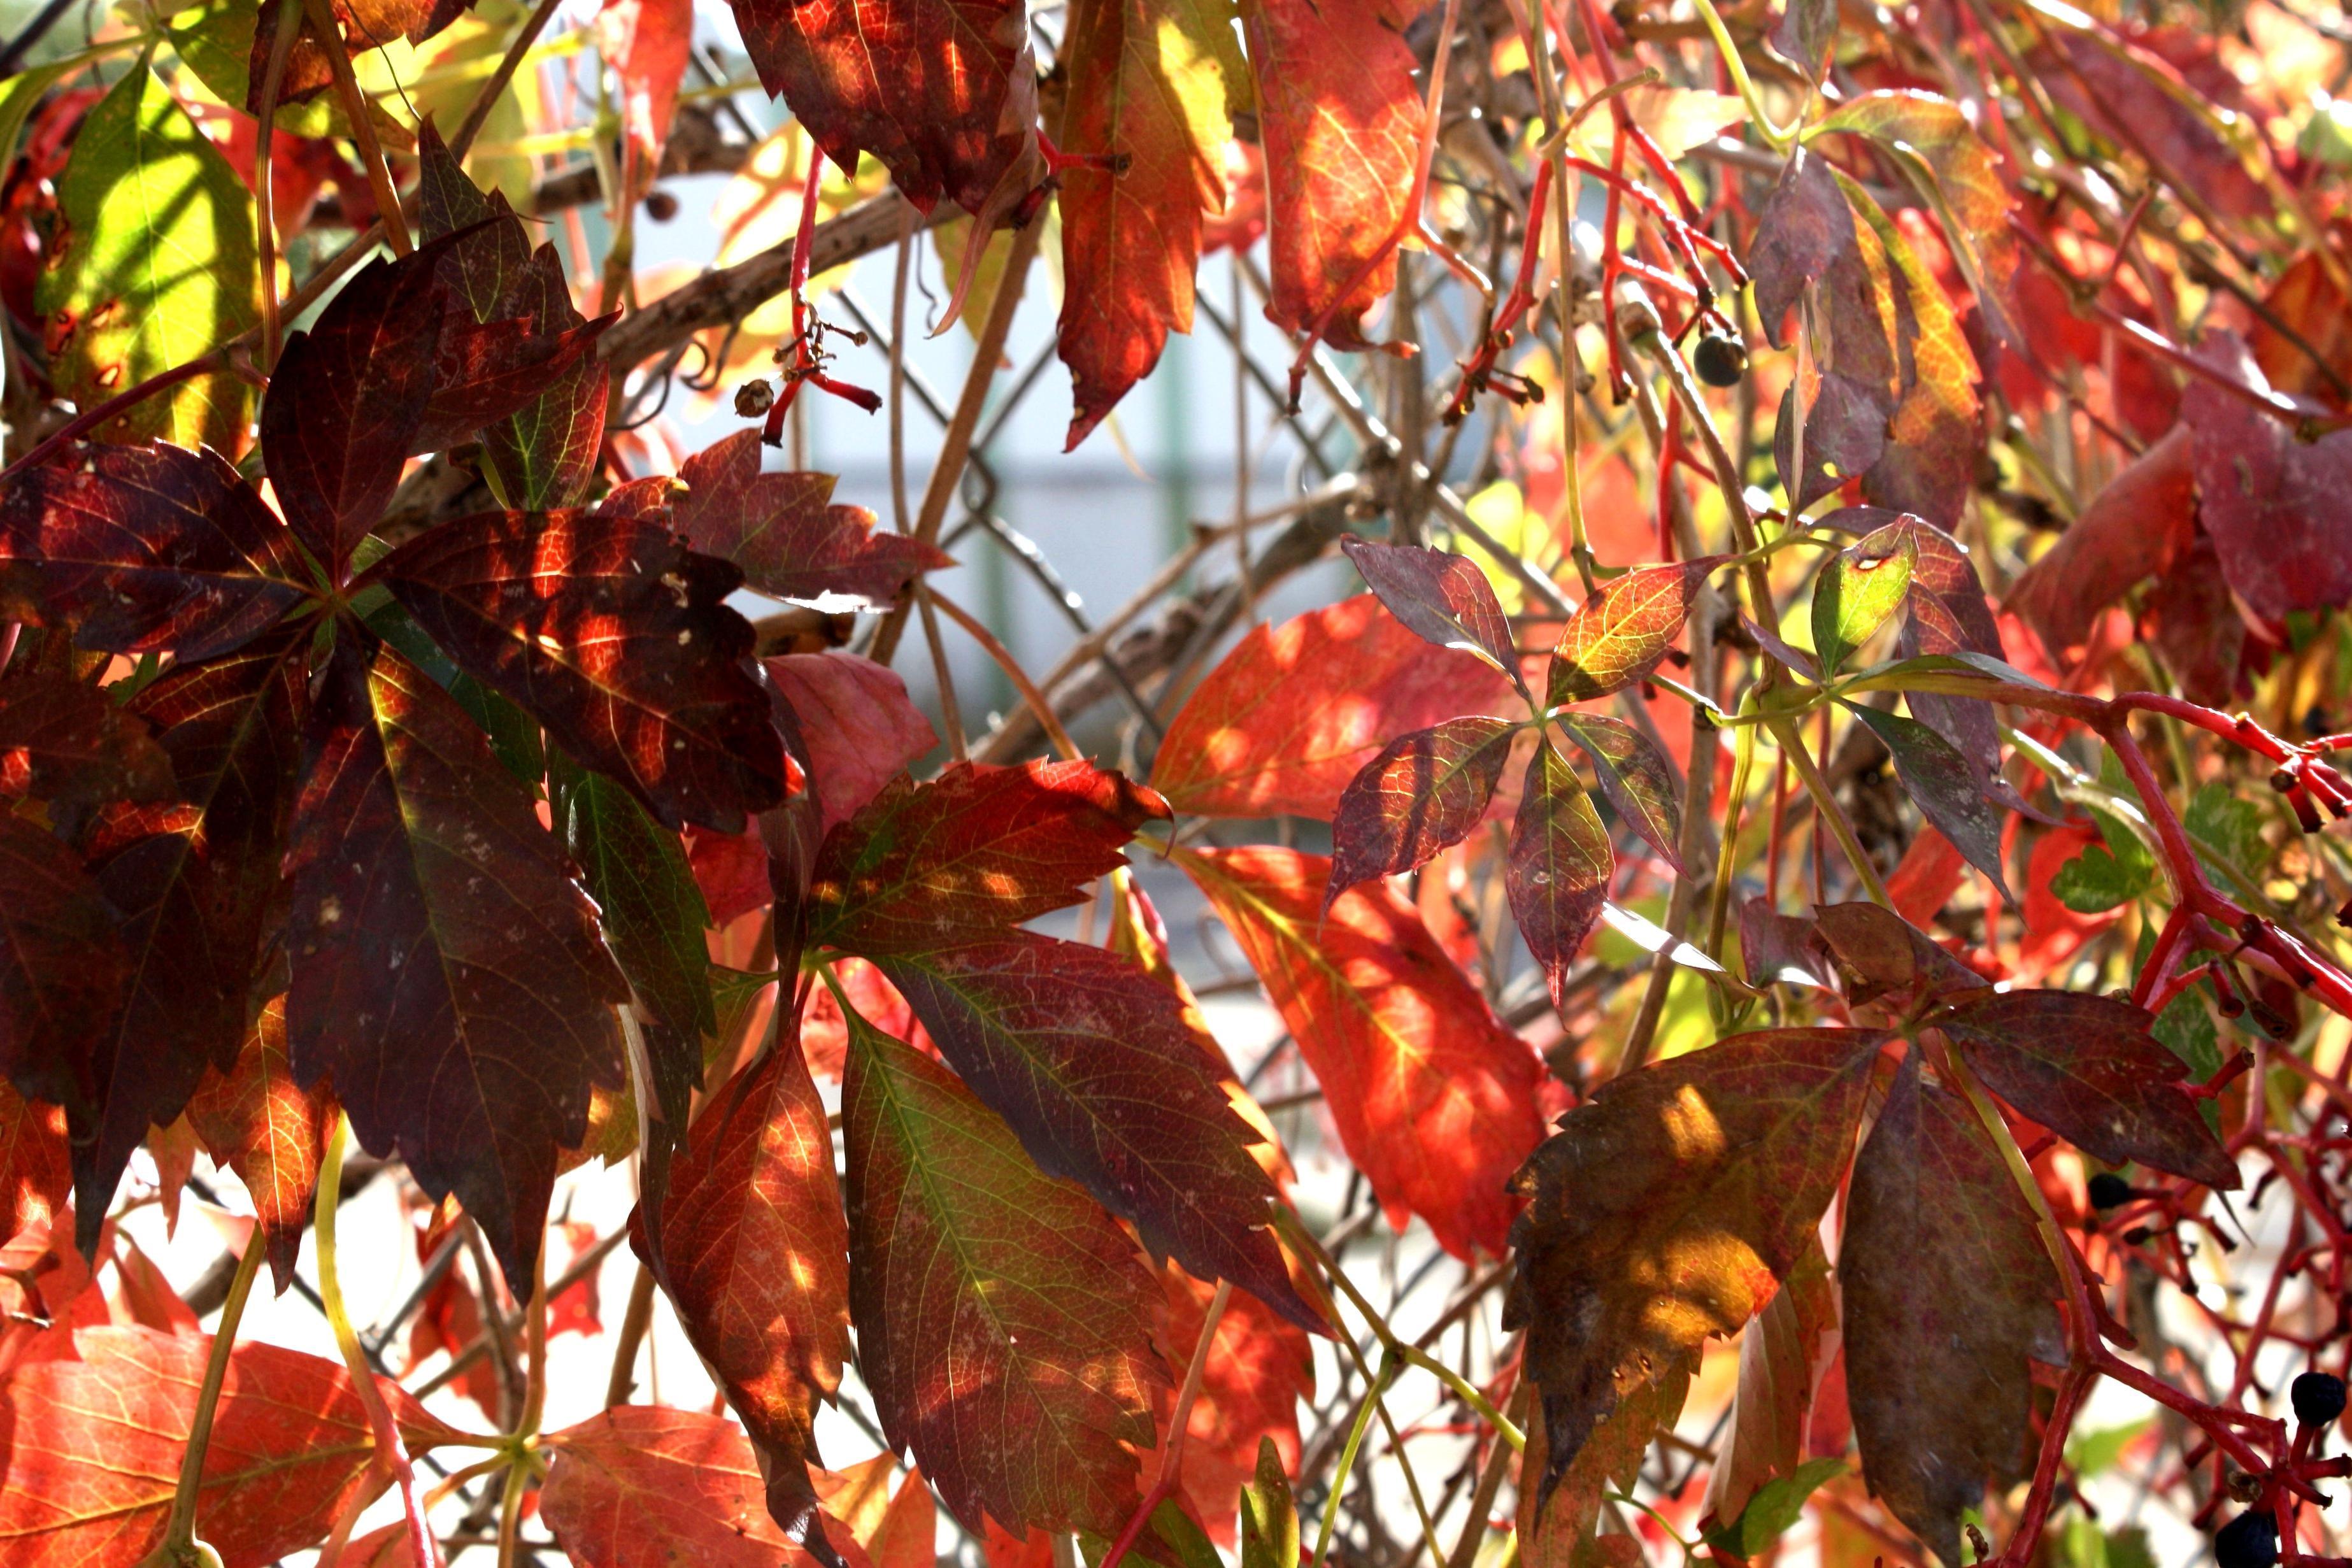 Pianta Foglie Rosse E Verdi foto gratis: autunno, foglie rosse, pianta rampicante